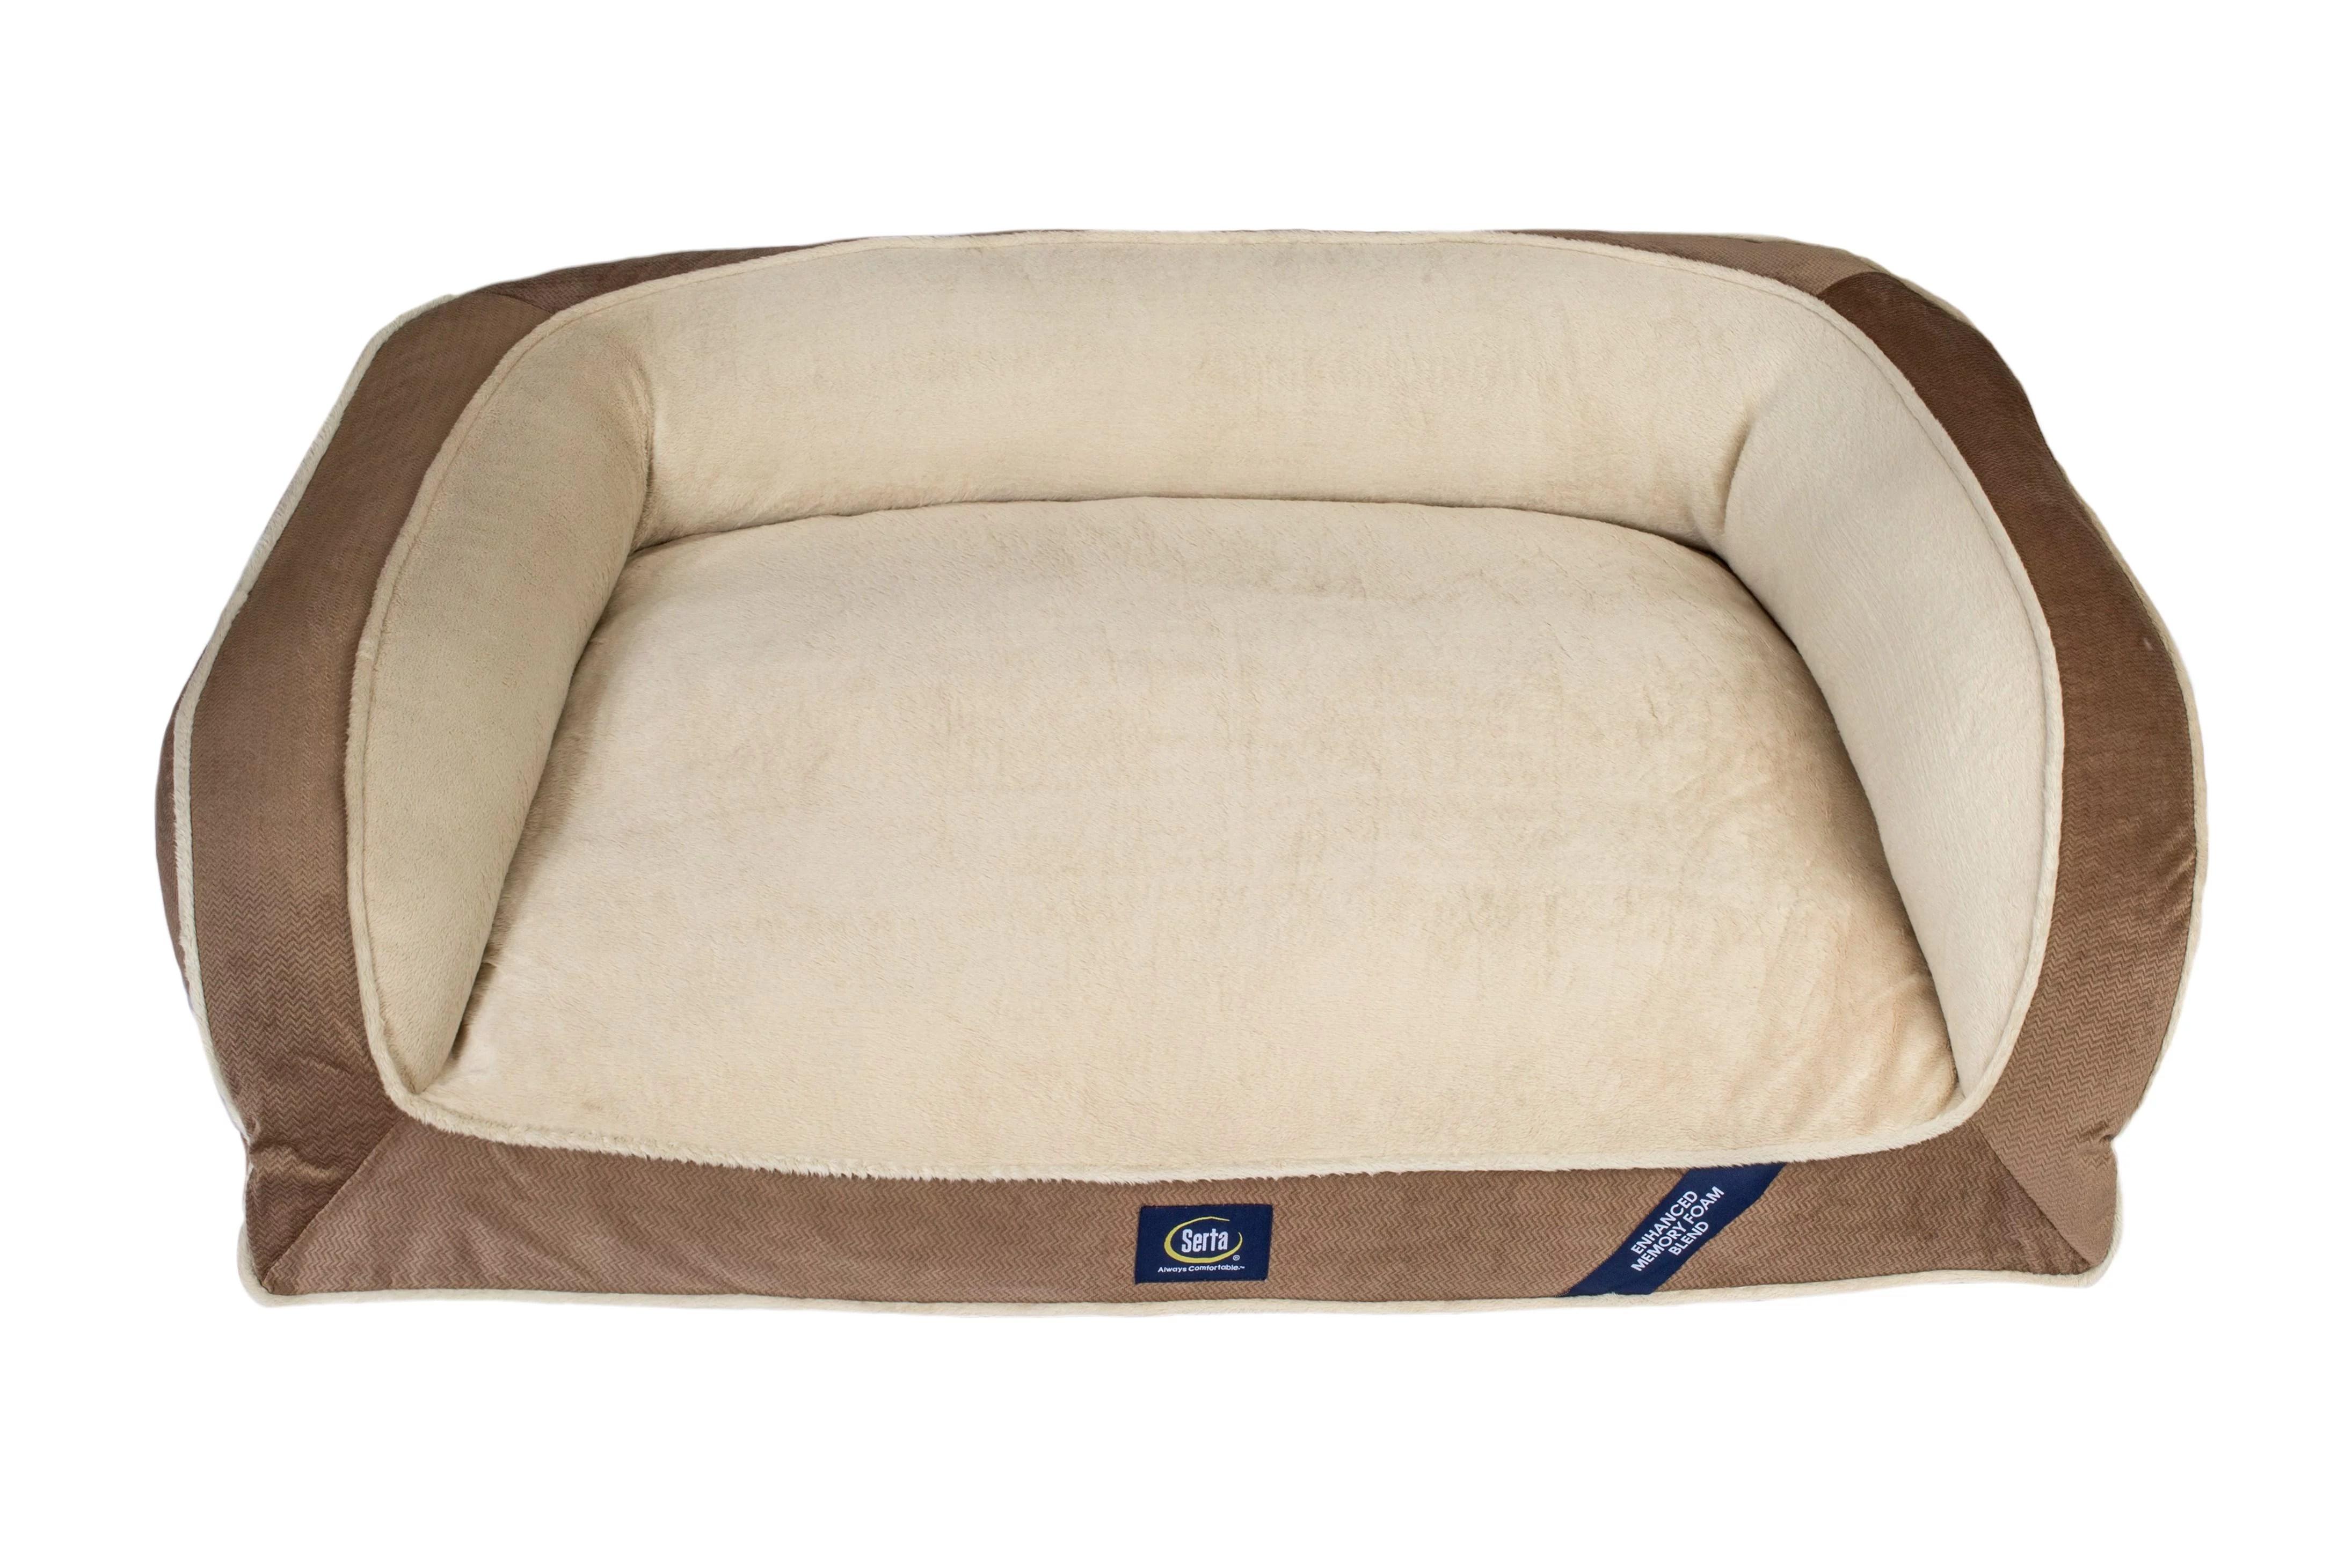 Sertapedic Memory Foam Couch Extra Large Pet Bed Brown 44 L Walmart Com Walmart Com